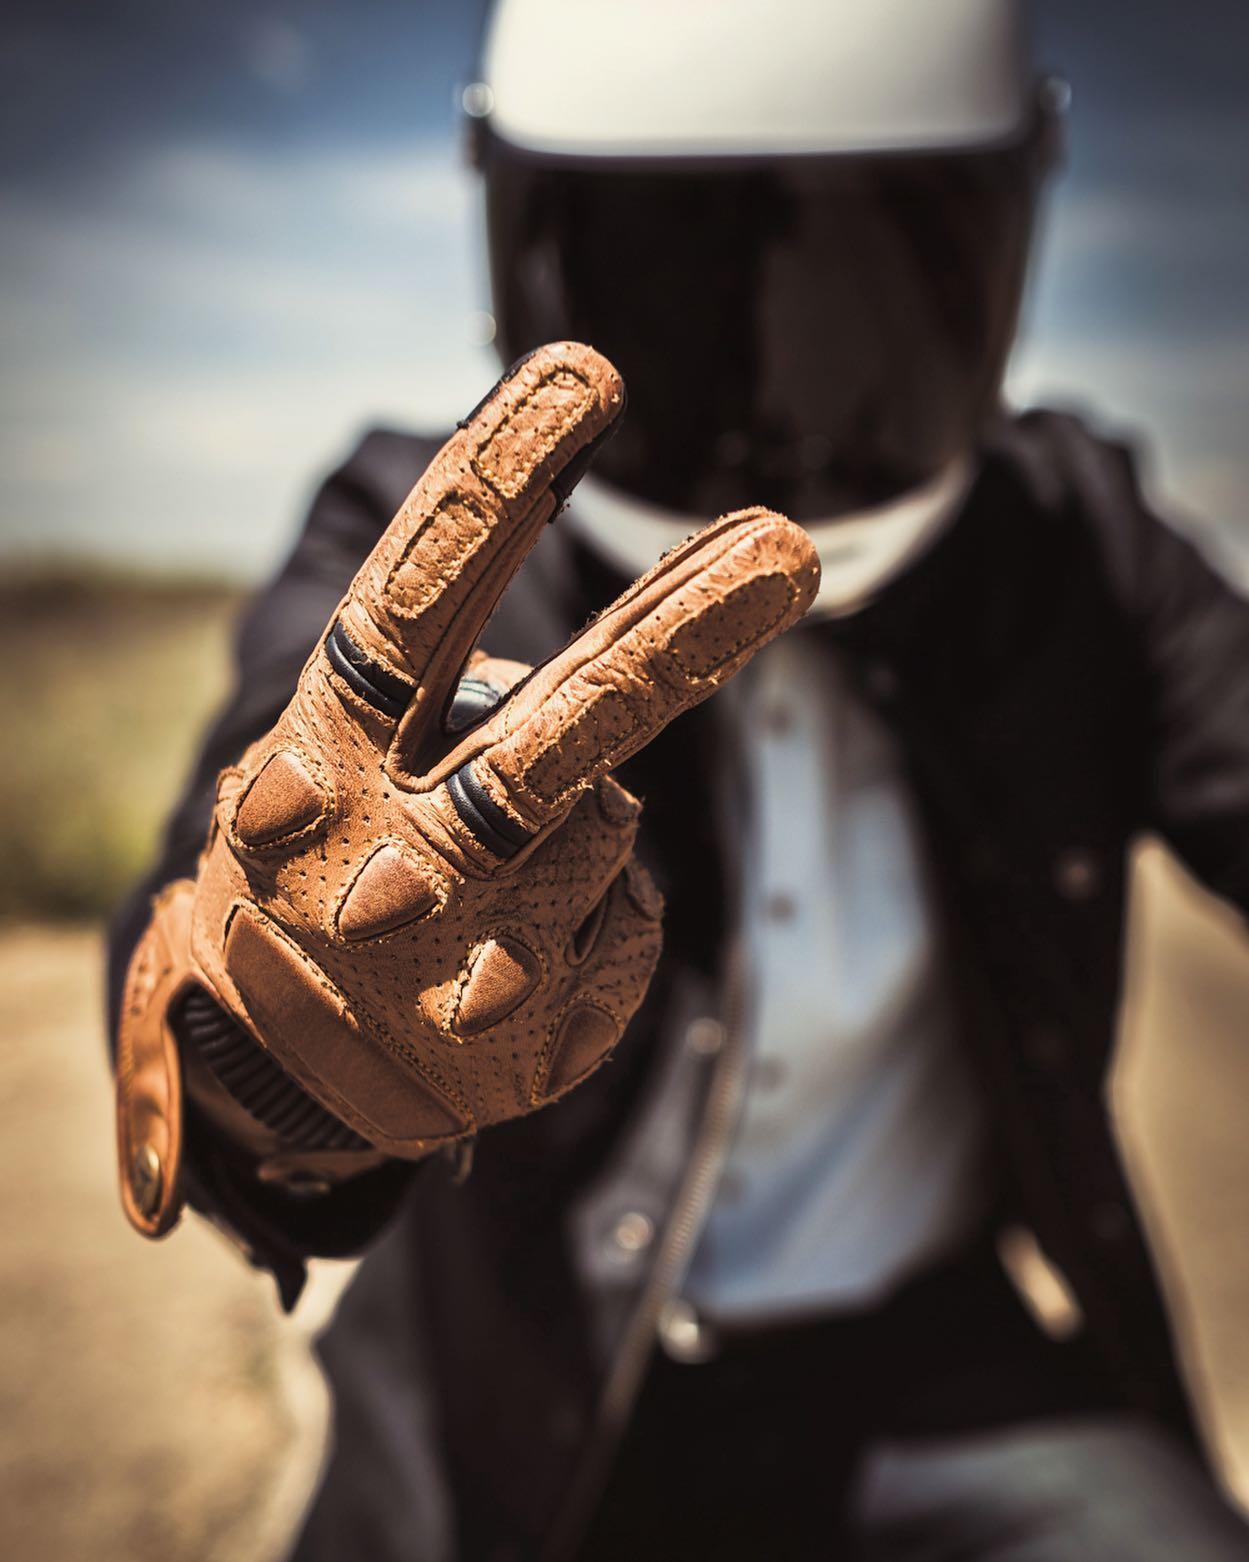 TPCustom_wehshop_By_Dity_Pilot_glove